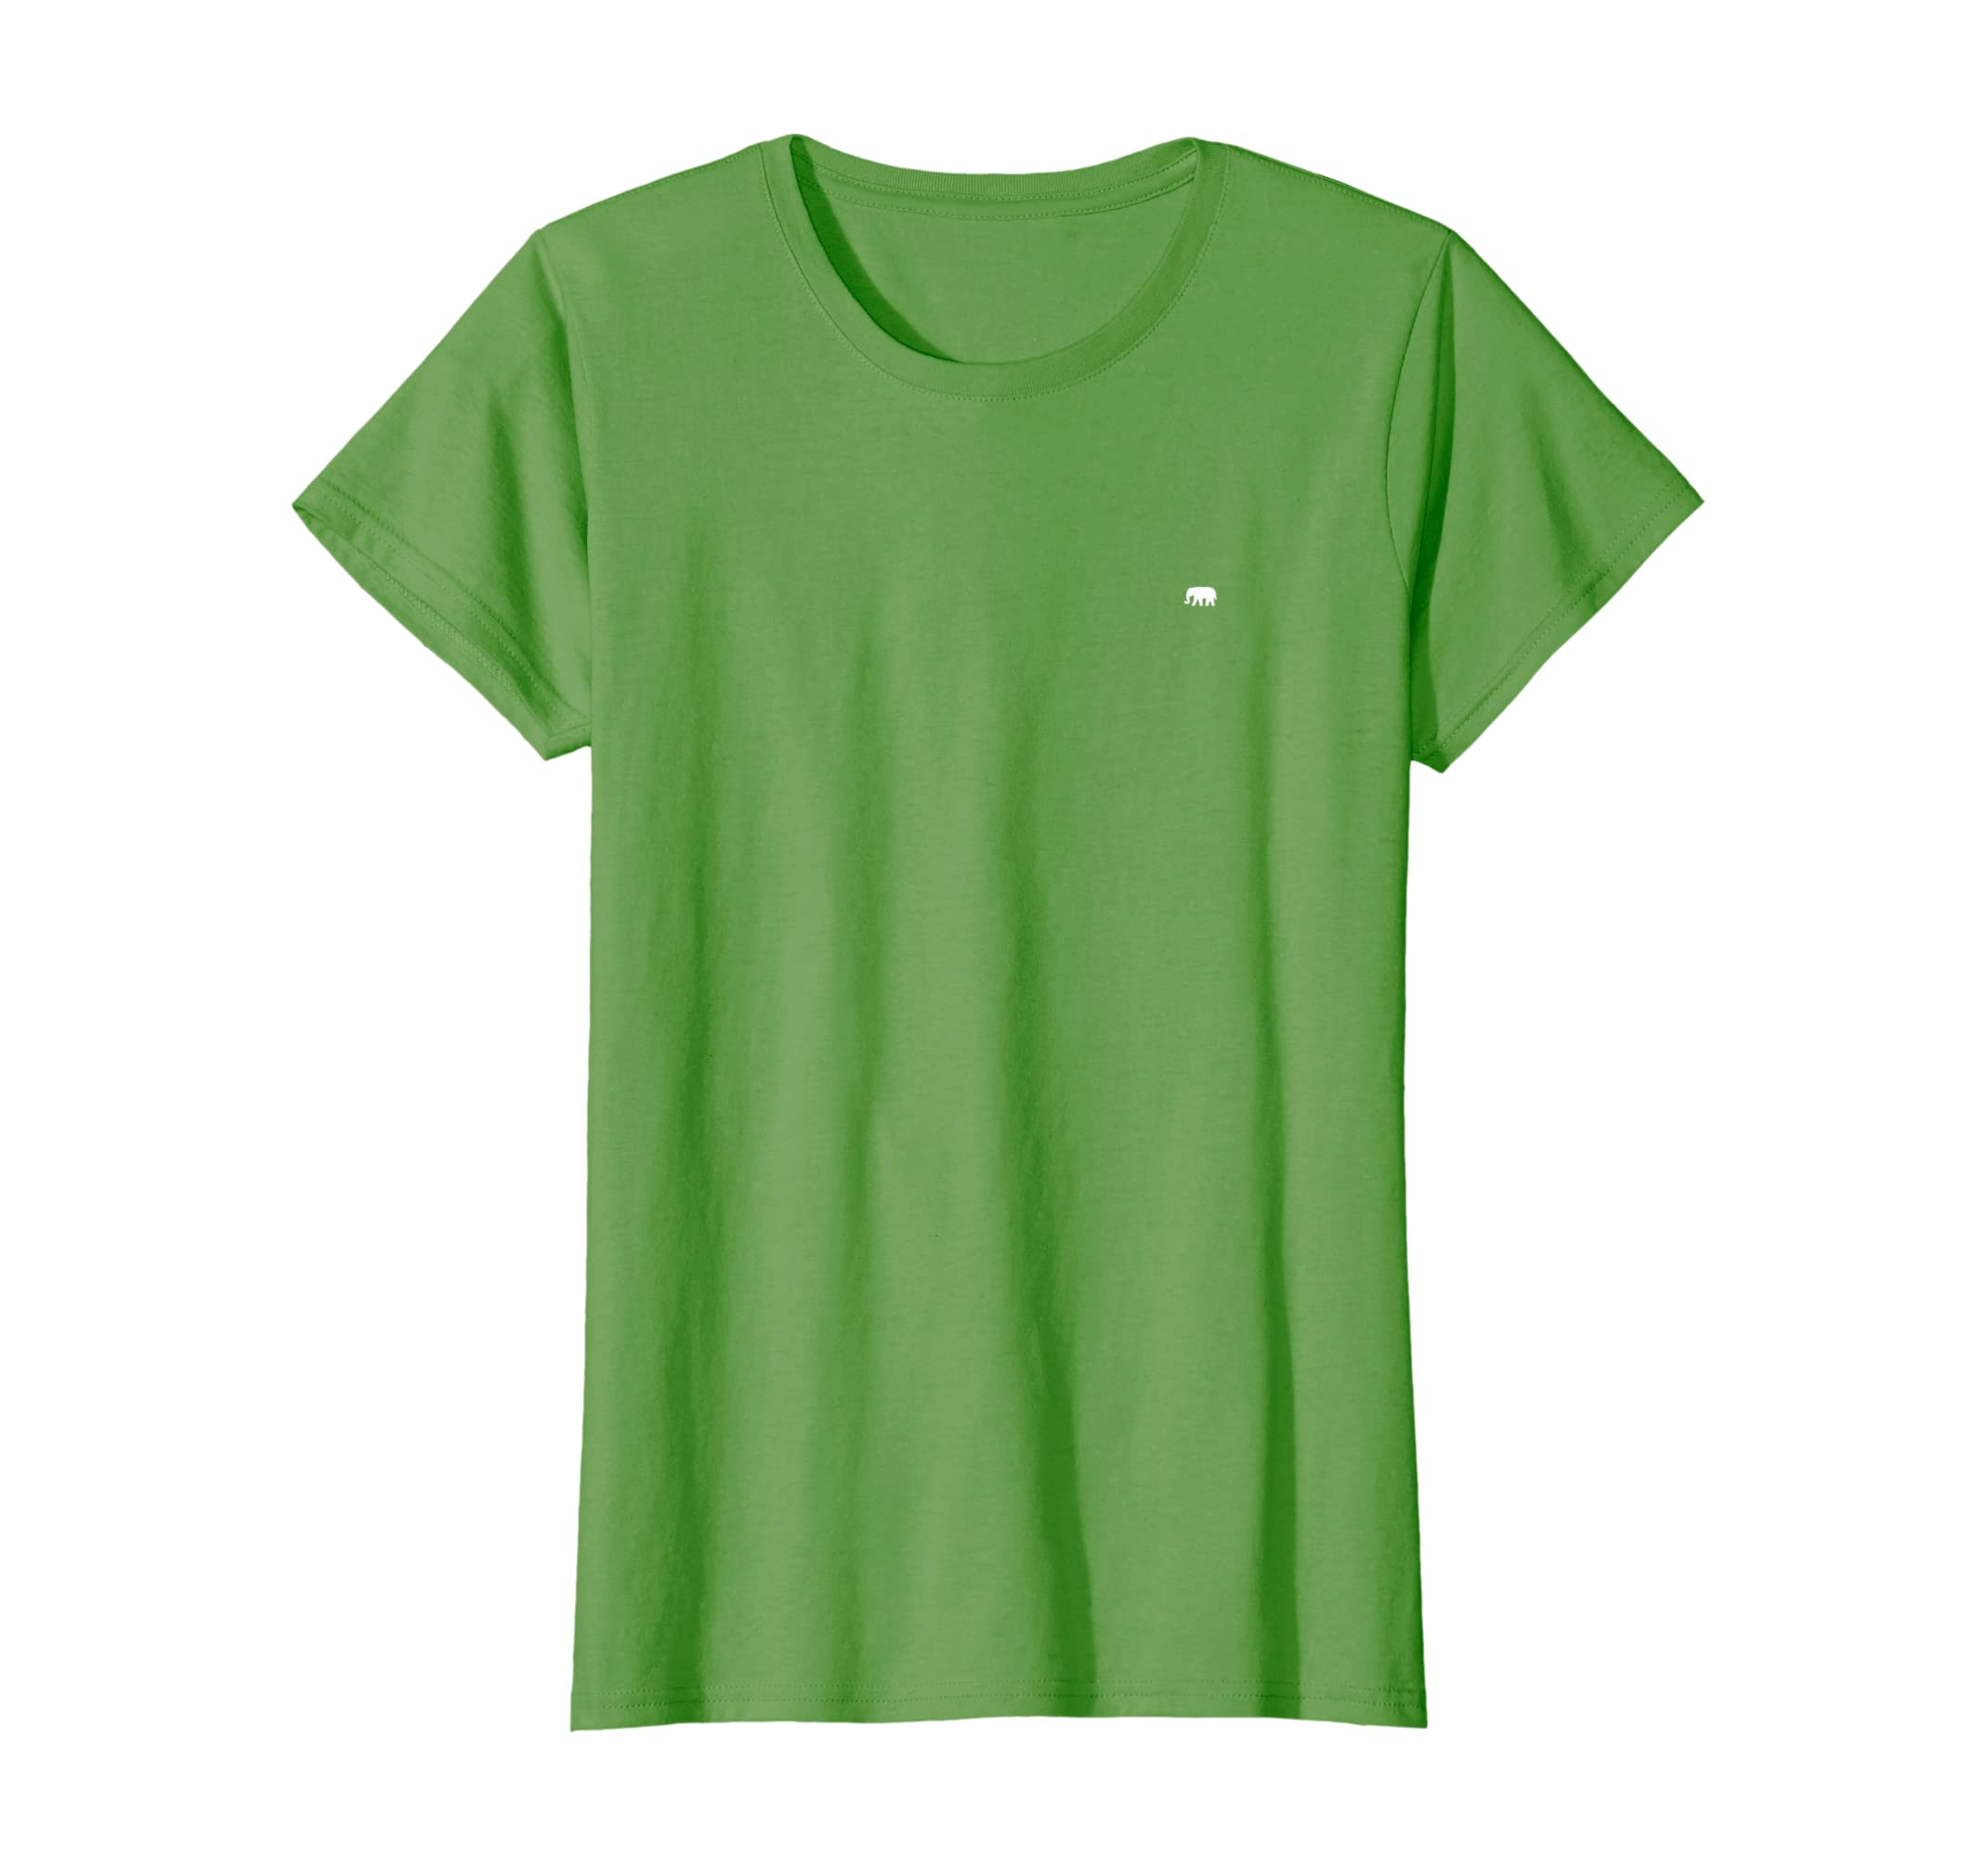 29c4e111e86 Amazon.com  Plain Green T Shirt For Boys  Green Shirts With Graphic Logo   Clothing